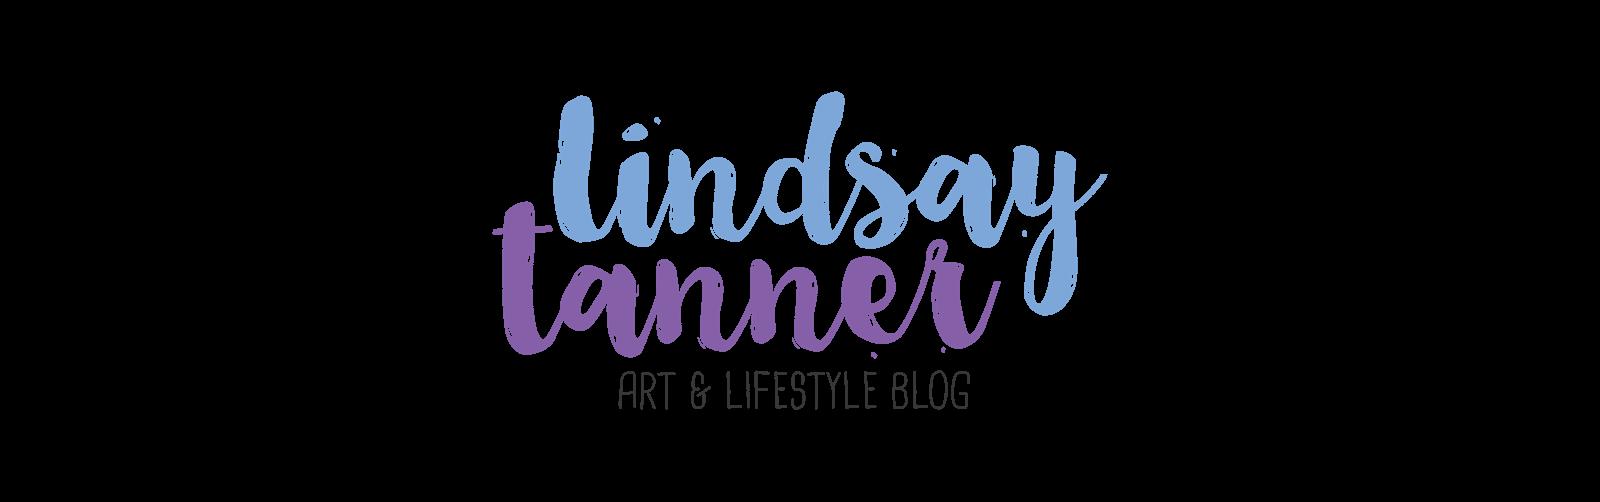 Lindsay Tanner